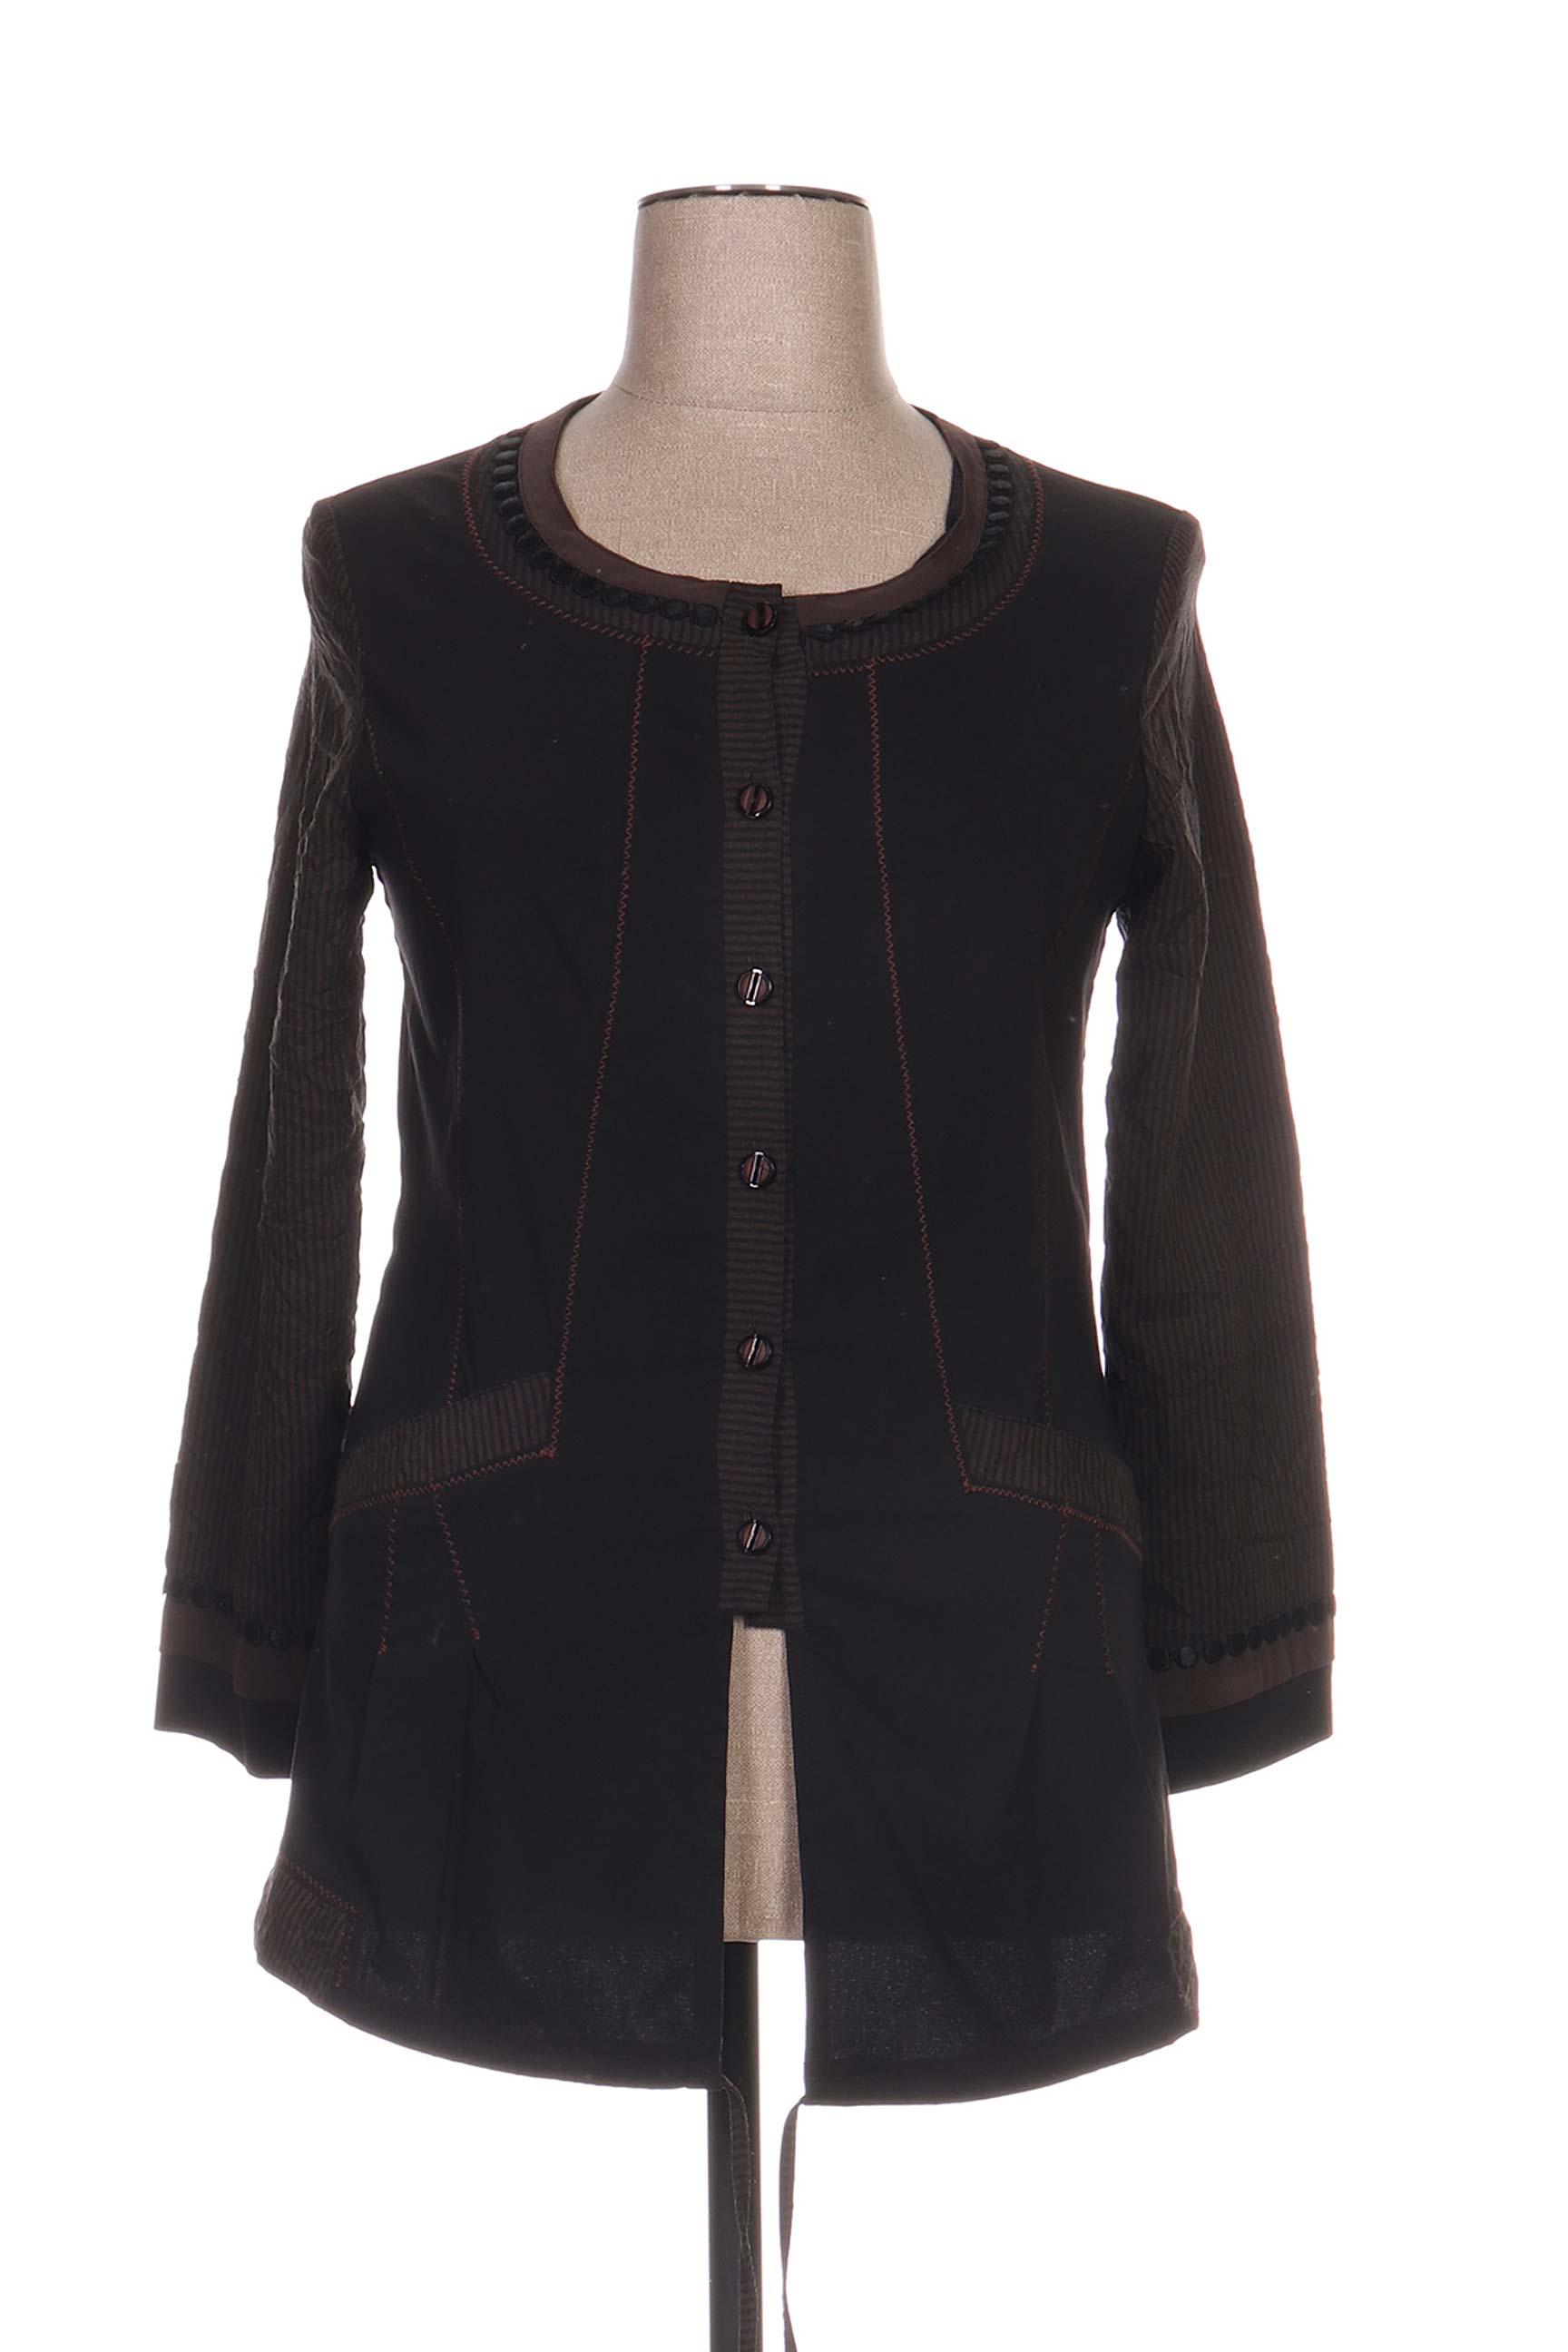 Veste casual femme Jean Gabriel noir taille : 44 37 FR (FR)